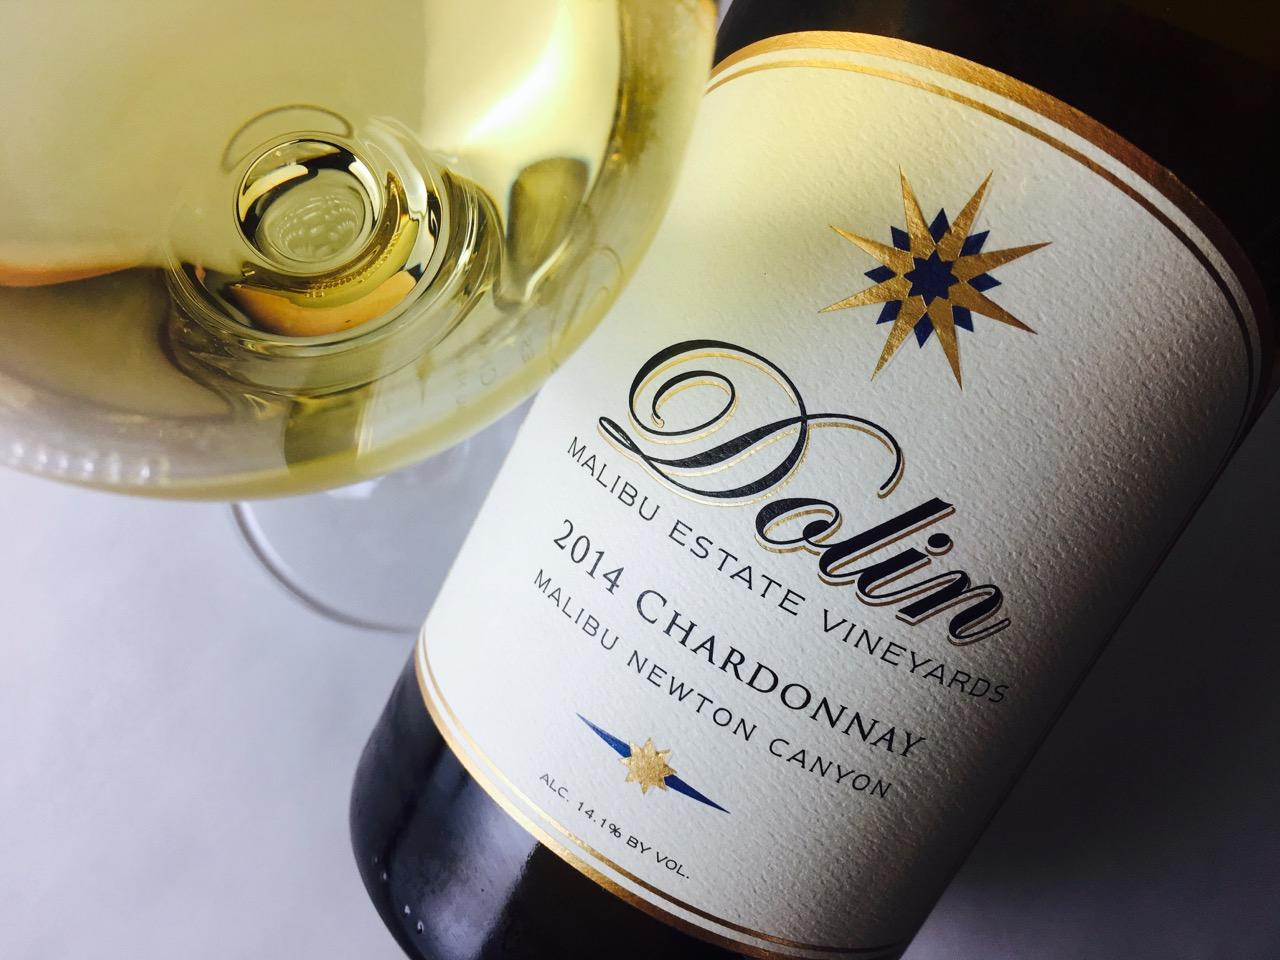 2014 Dolin Chardonnay Malibu Newton Canyon